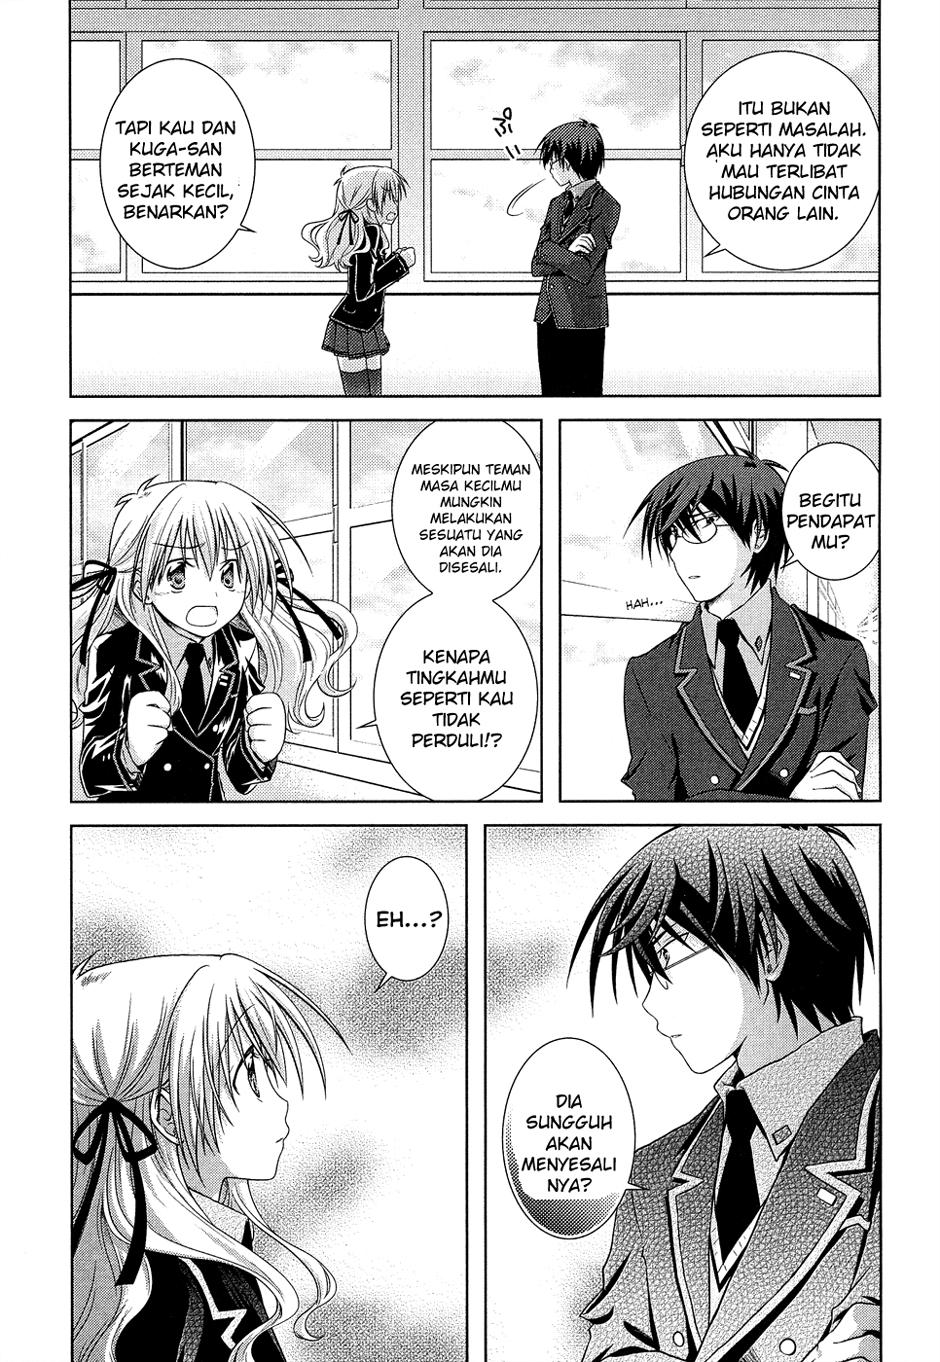 Komik iris zero 011 12 Indonesia iris zero 011 Terbaru 12 Baca Manga Komik Indonesia 